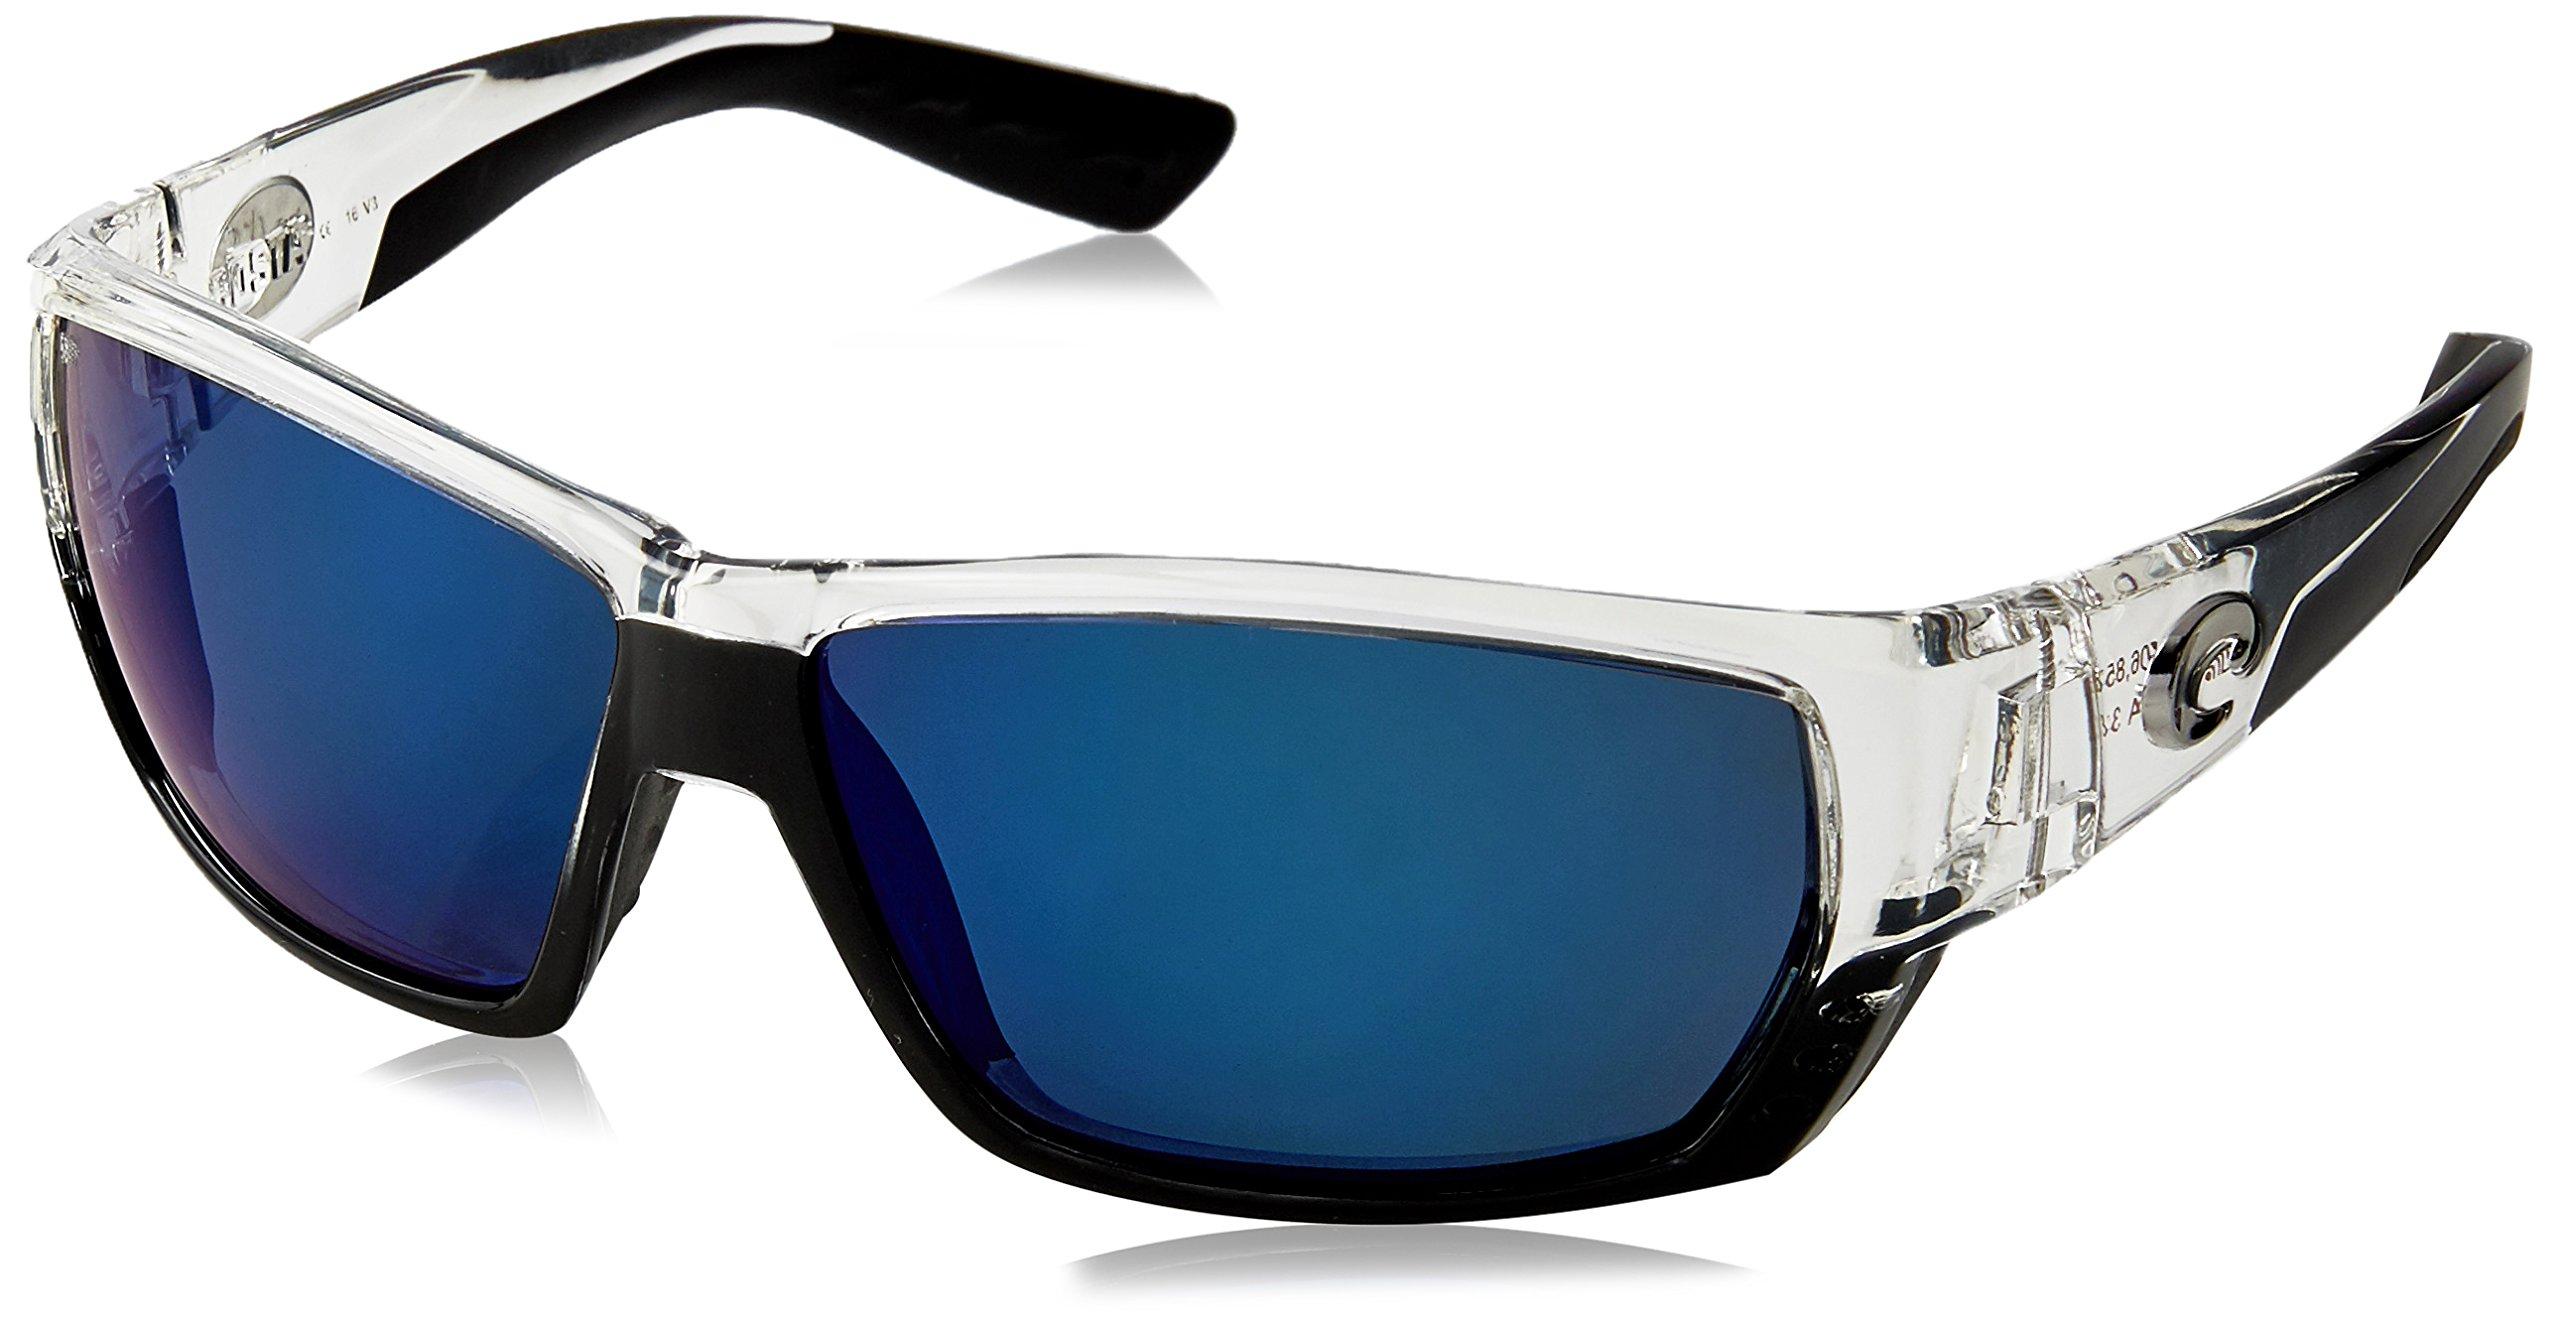 Costa Del Mar Tuna Alley Sunglasses, Crystal, Blue Mirror 580 Plastic Lens